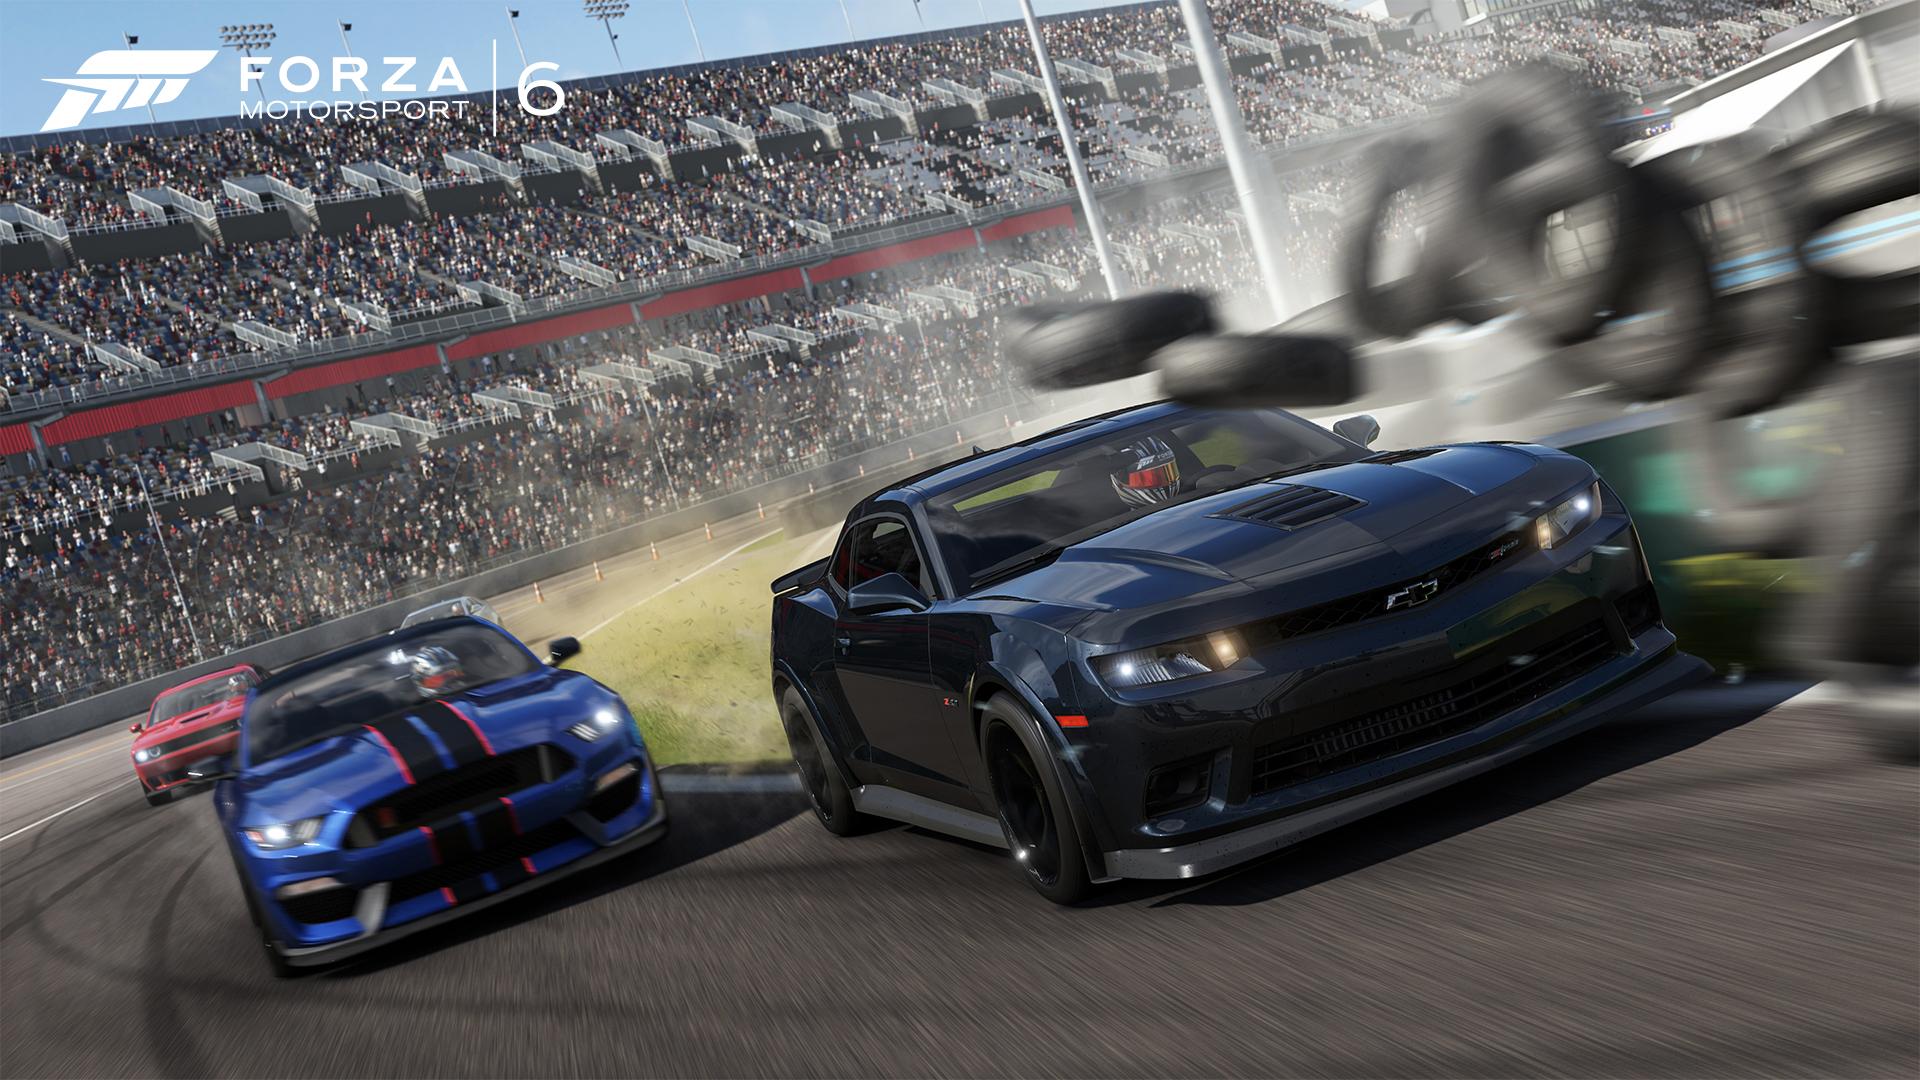 Forza Motorsport 6 (XO) - the new race leader